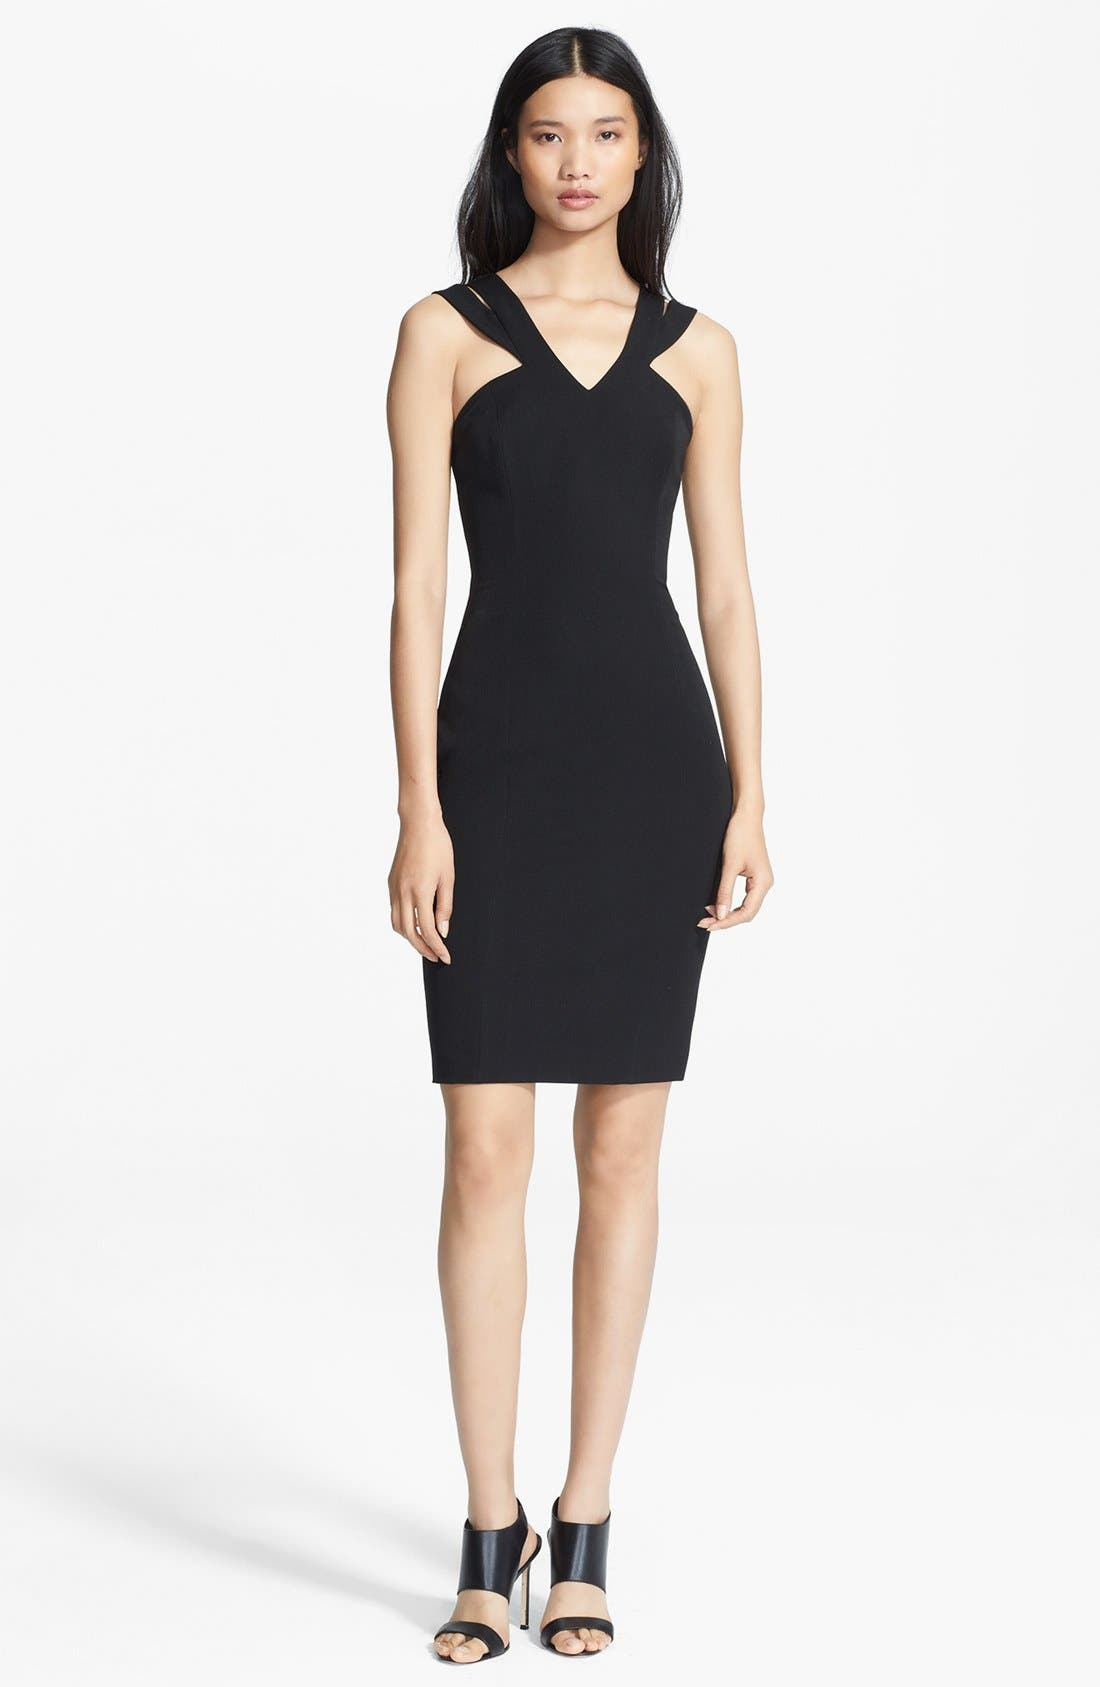 Alternate Image 1 Selected - Jay Godfrey 'Skoll' Double Strap Stretch Crepe Dress